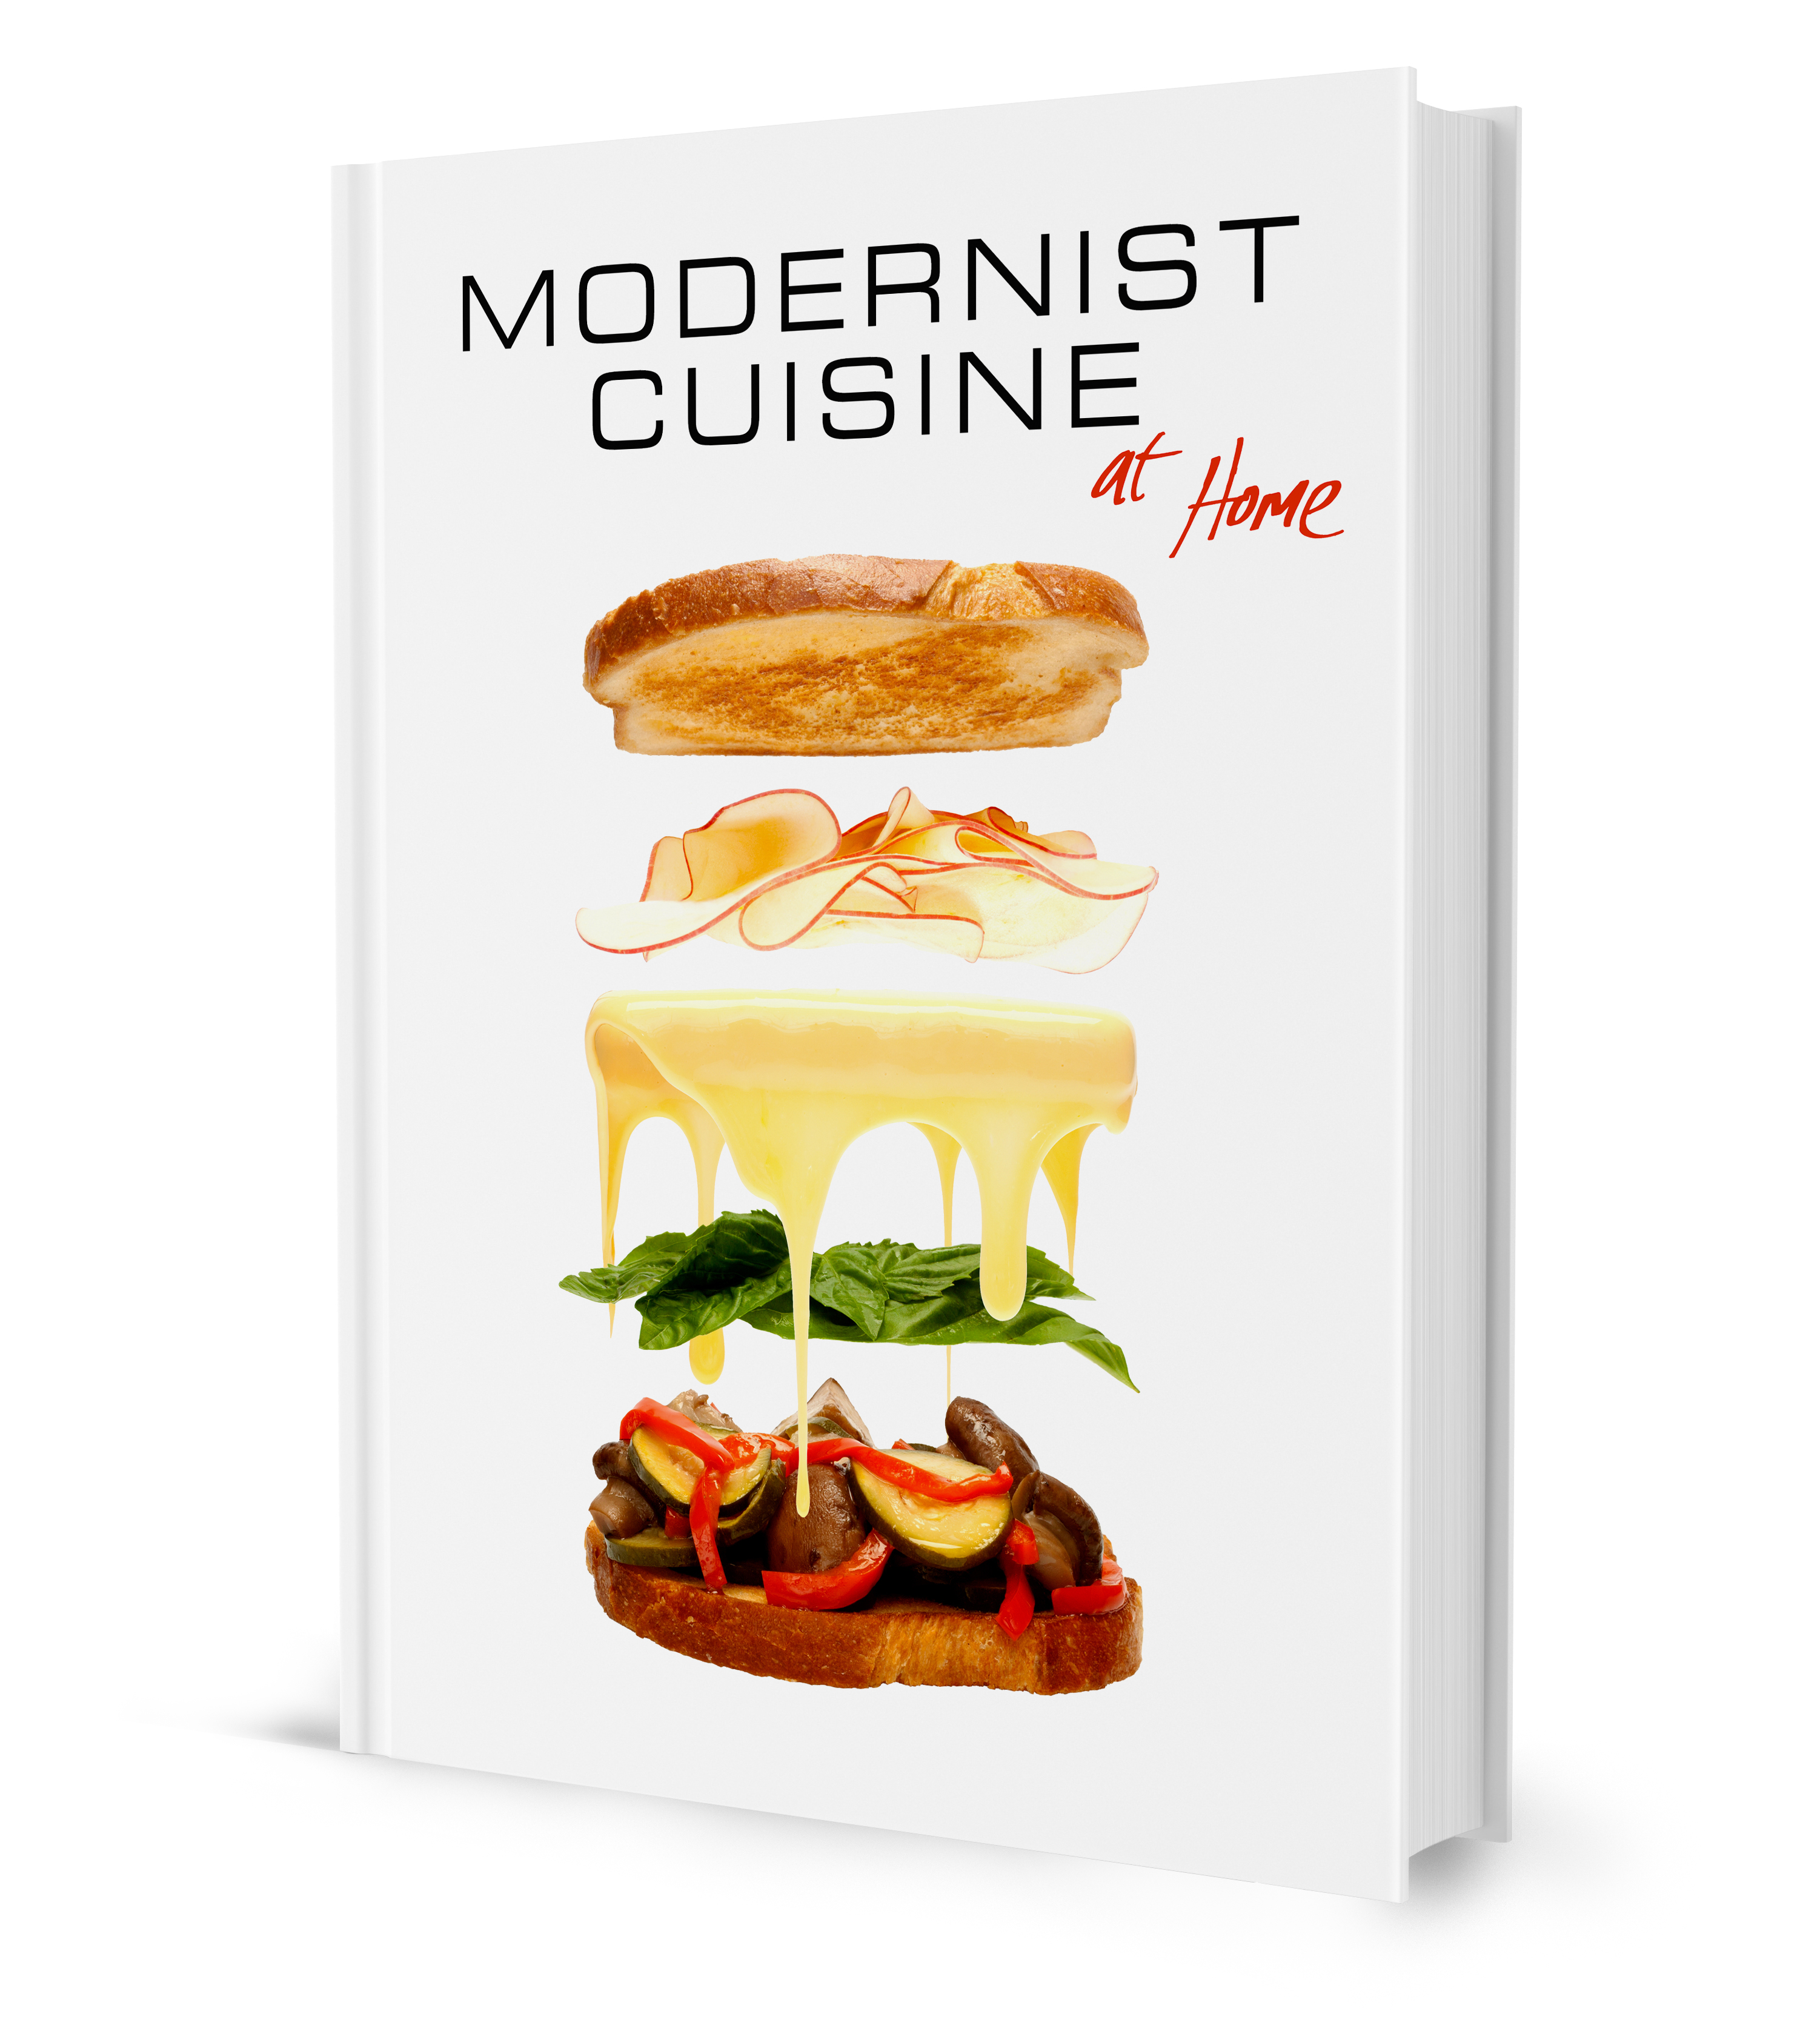 modernist cuisine updated for home cookingluxury news best of luxury interviews event calendar